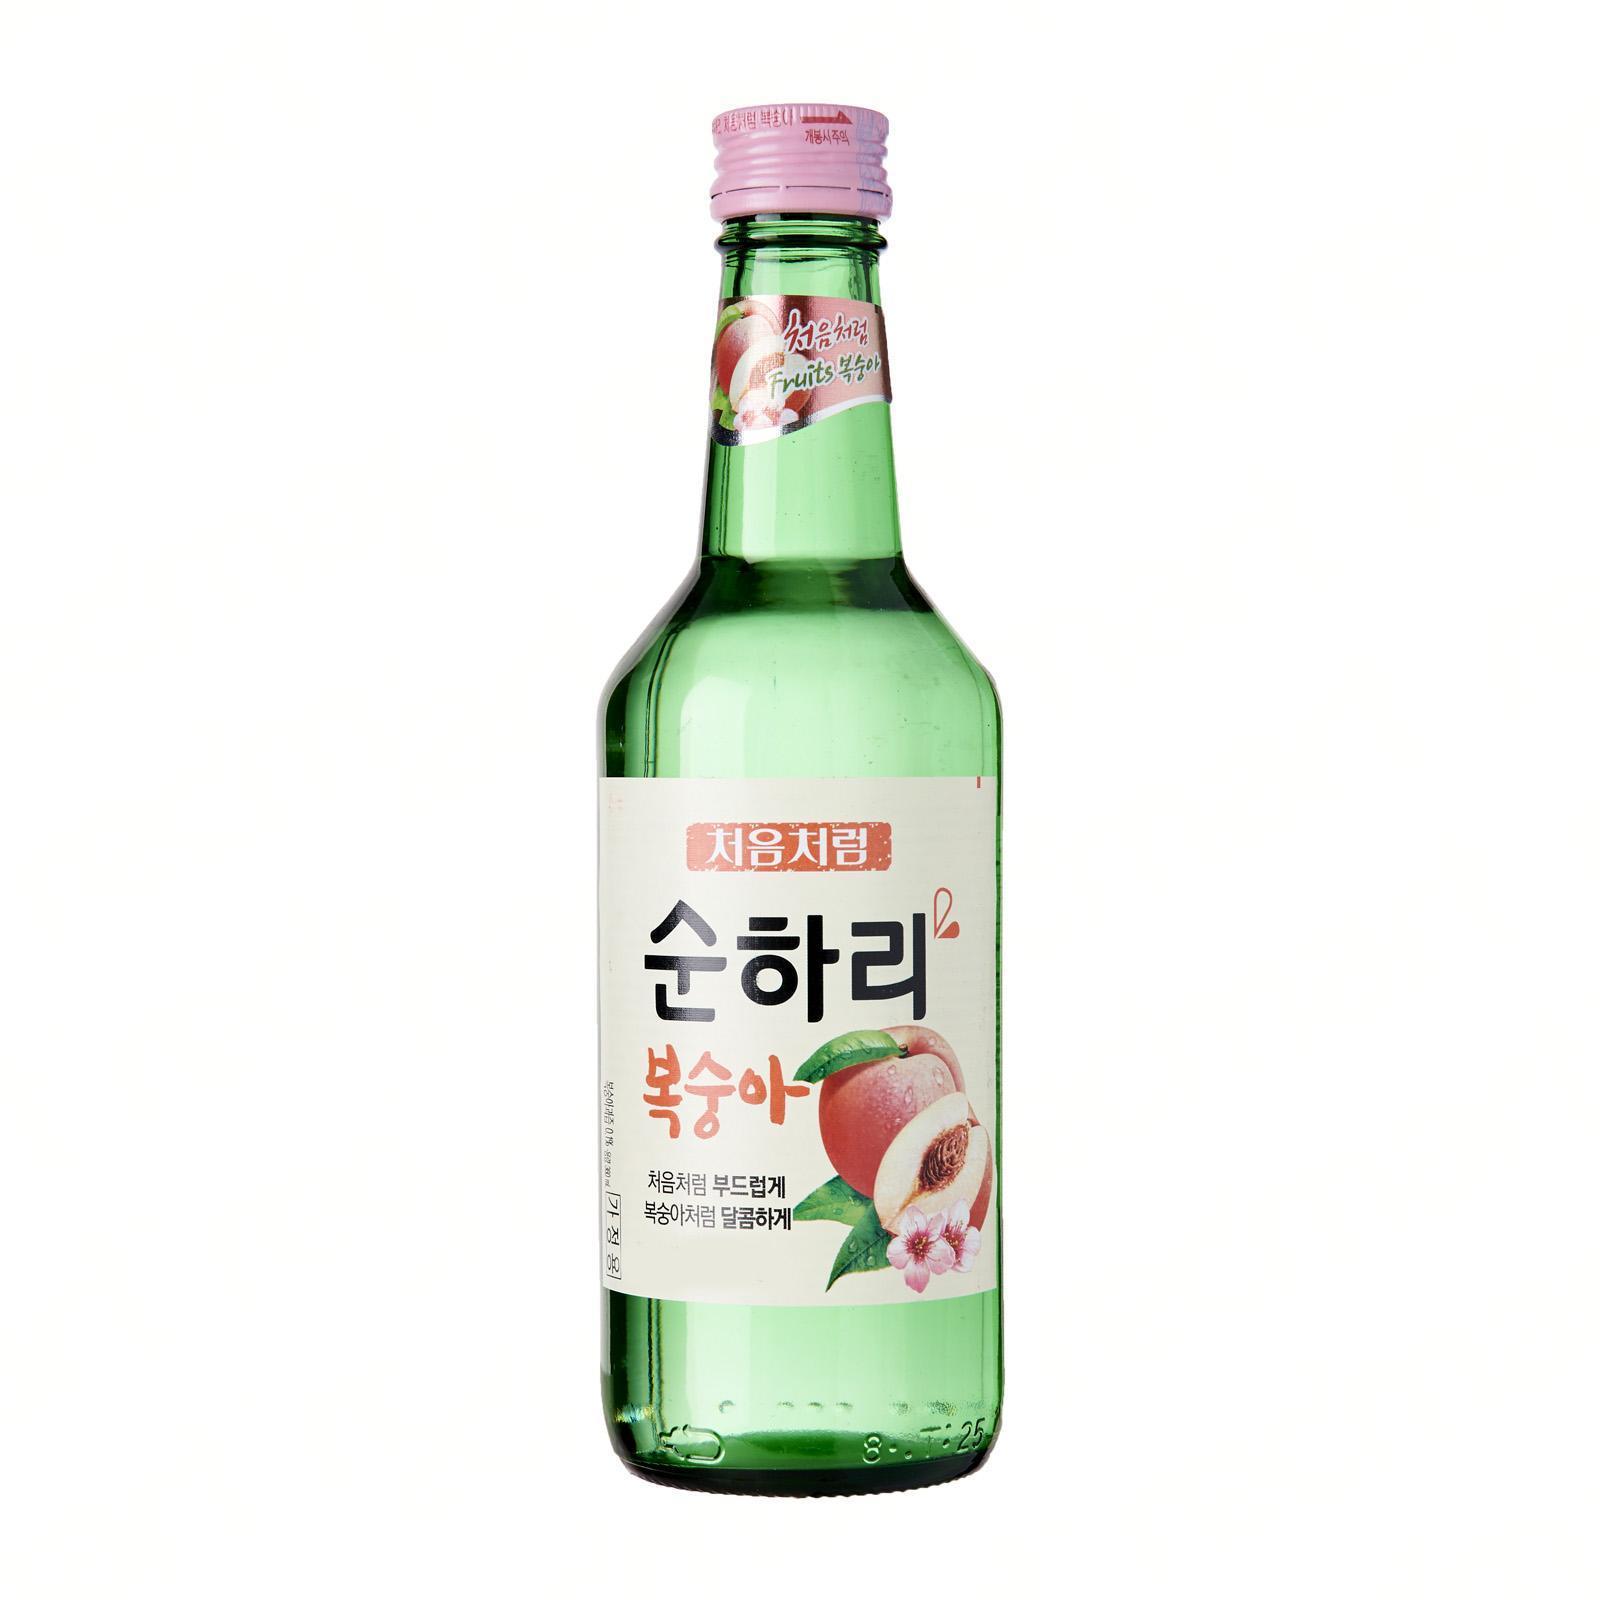 Lotte Chumchurum Korean Soju - Peach